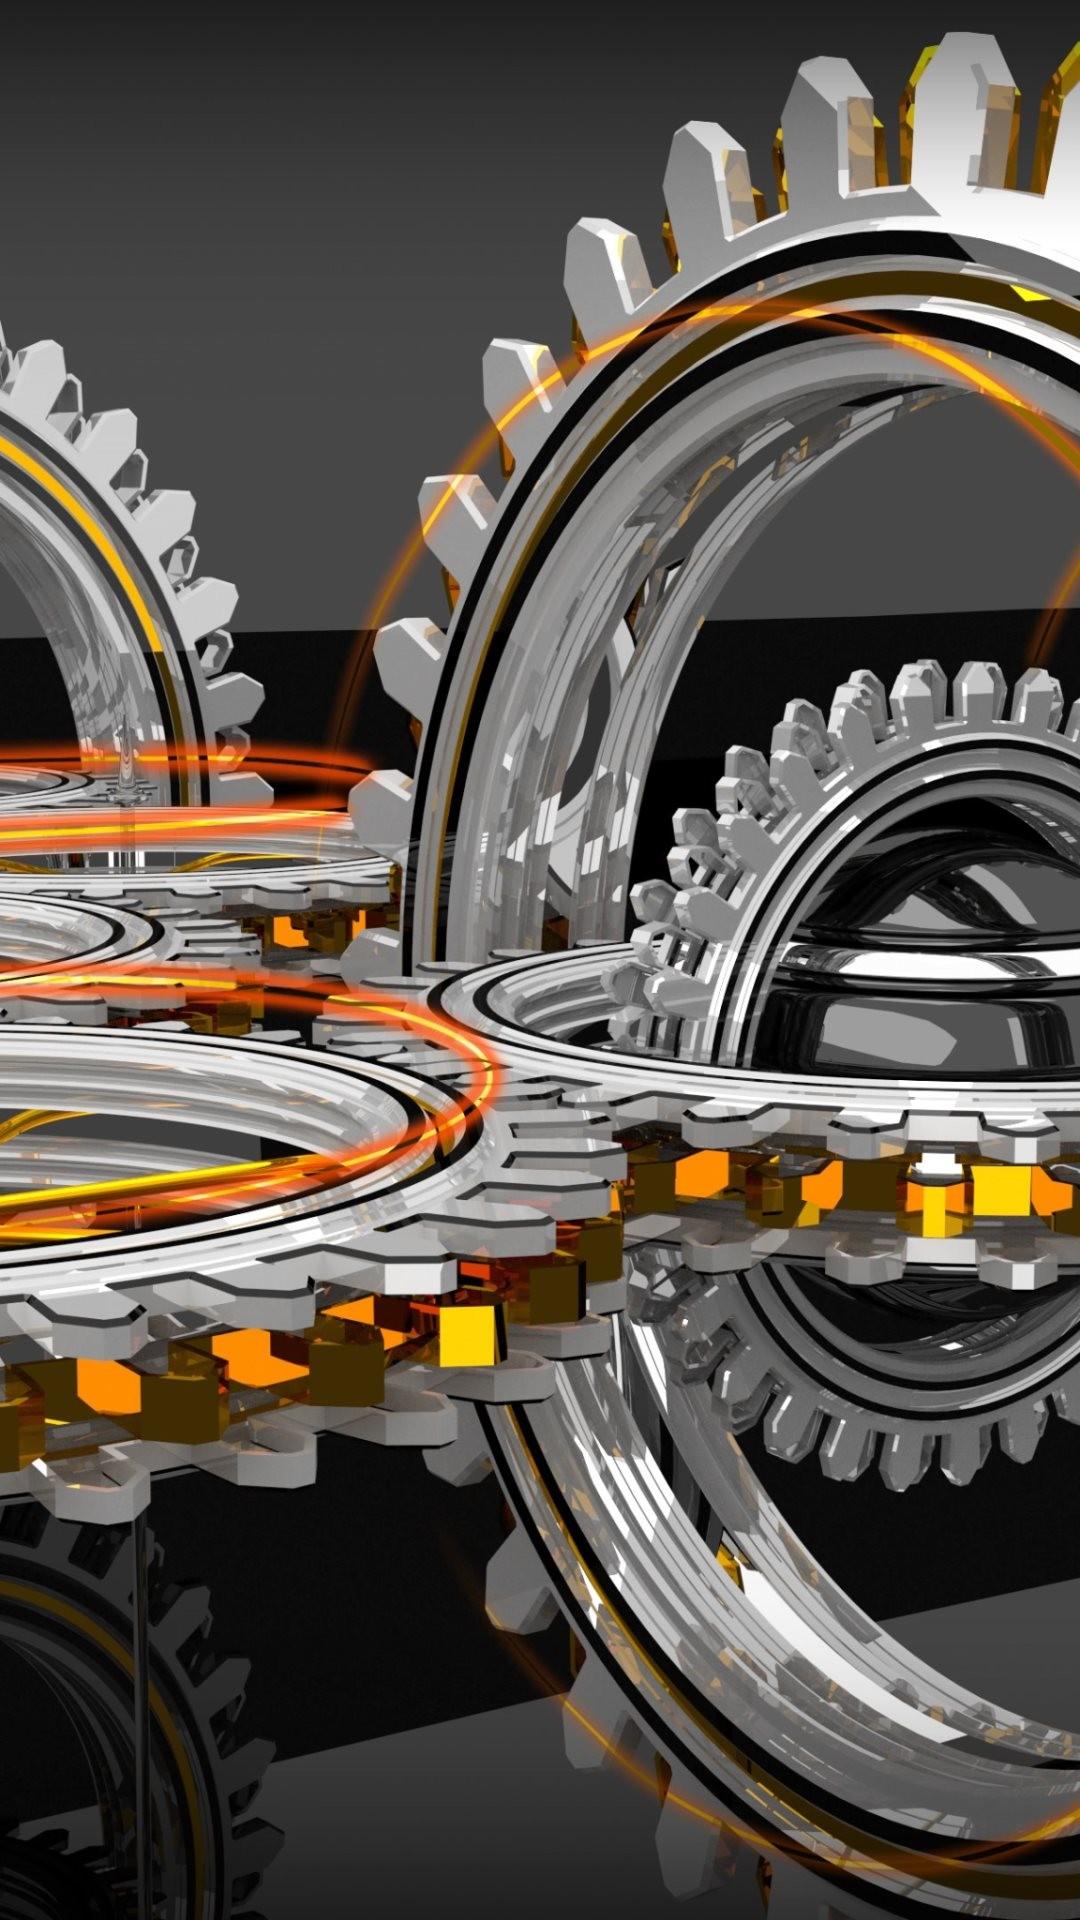 1080x1920, Engineering Wallpaper - Mechanical Engineering Wallpaper 16 9 - HD Wallpaper